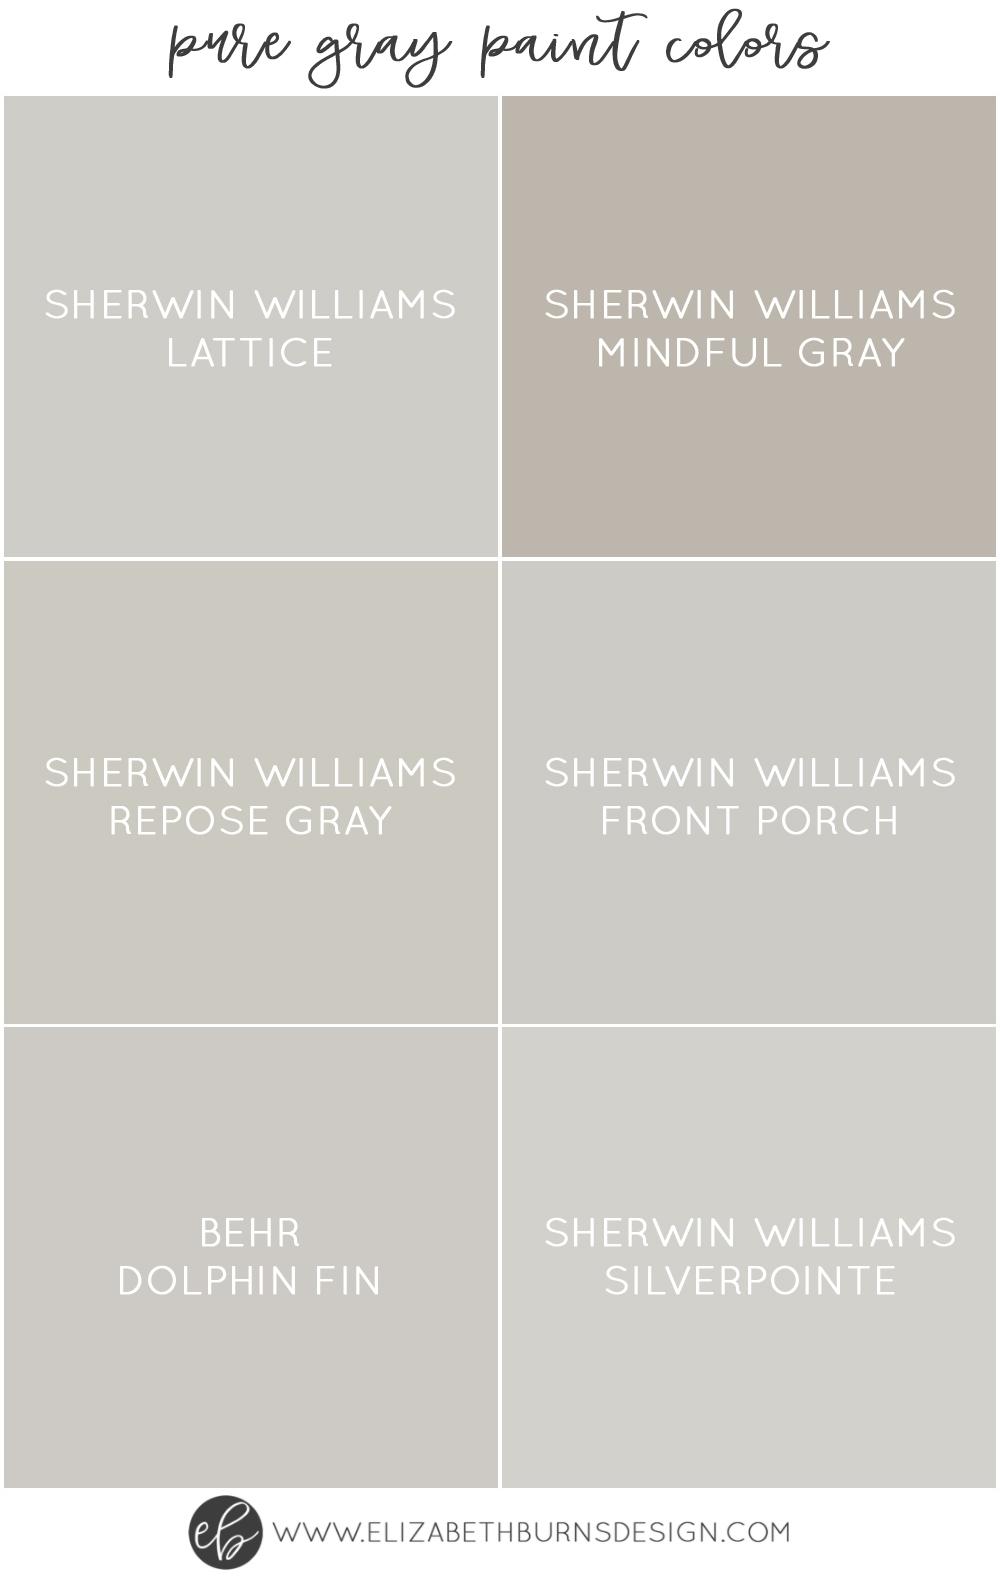 Elizabeth Burns Design | Pure Gray Paint Colors - Sherwin Williams Lattice, Sherwin Williams Mindful Gray, Sherwin Williams Repose Gray, Sherwin Williams Front Porch, Behr Dolphin Fin, Sherwin Williams Silverpointe